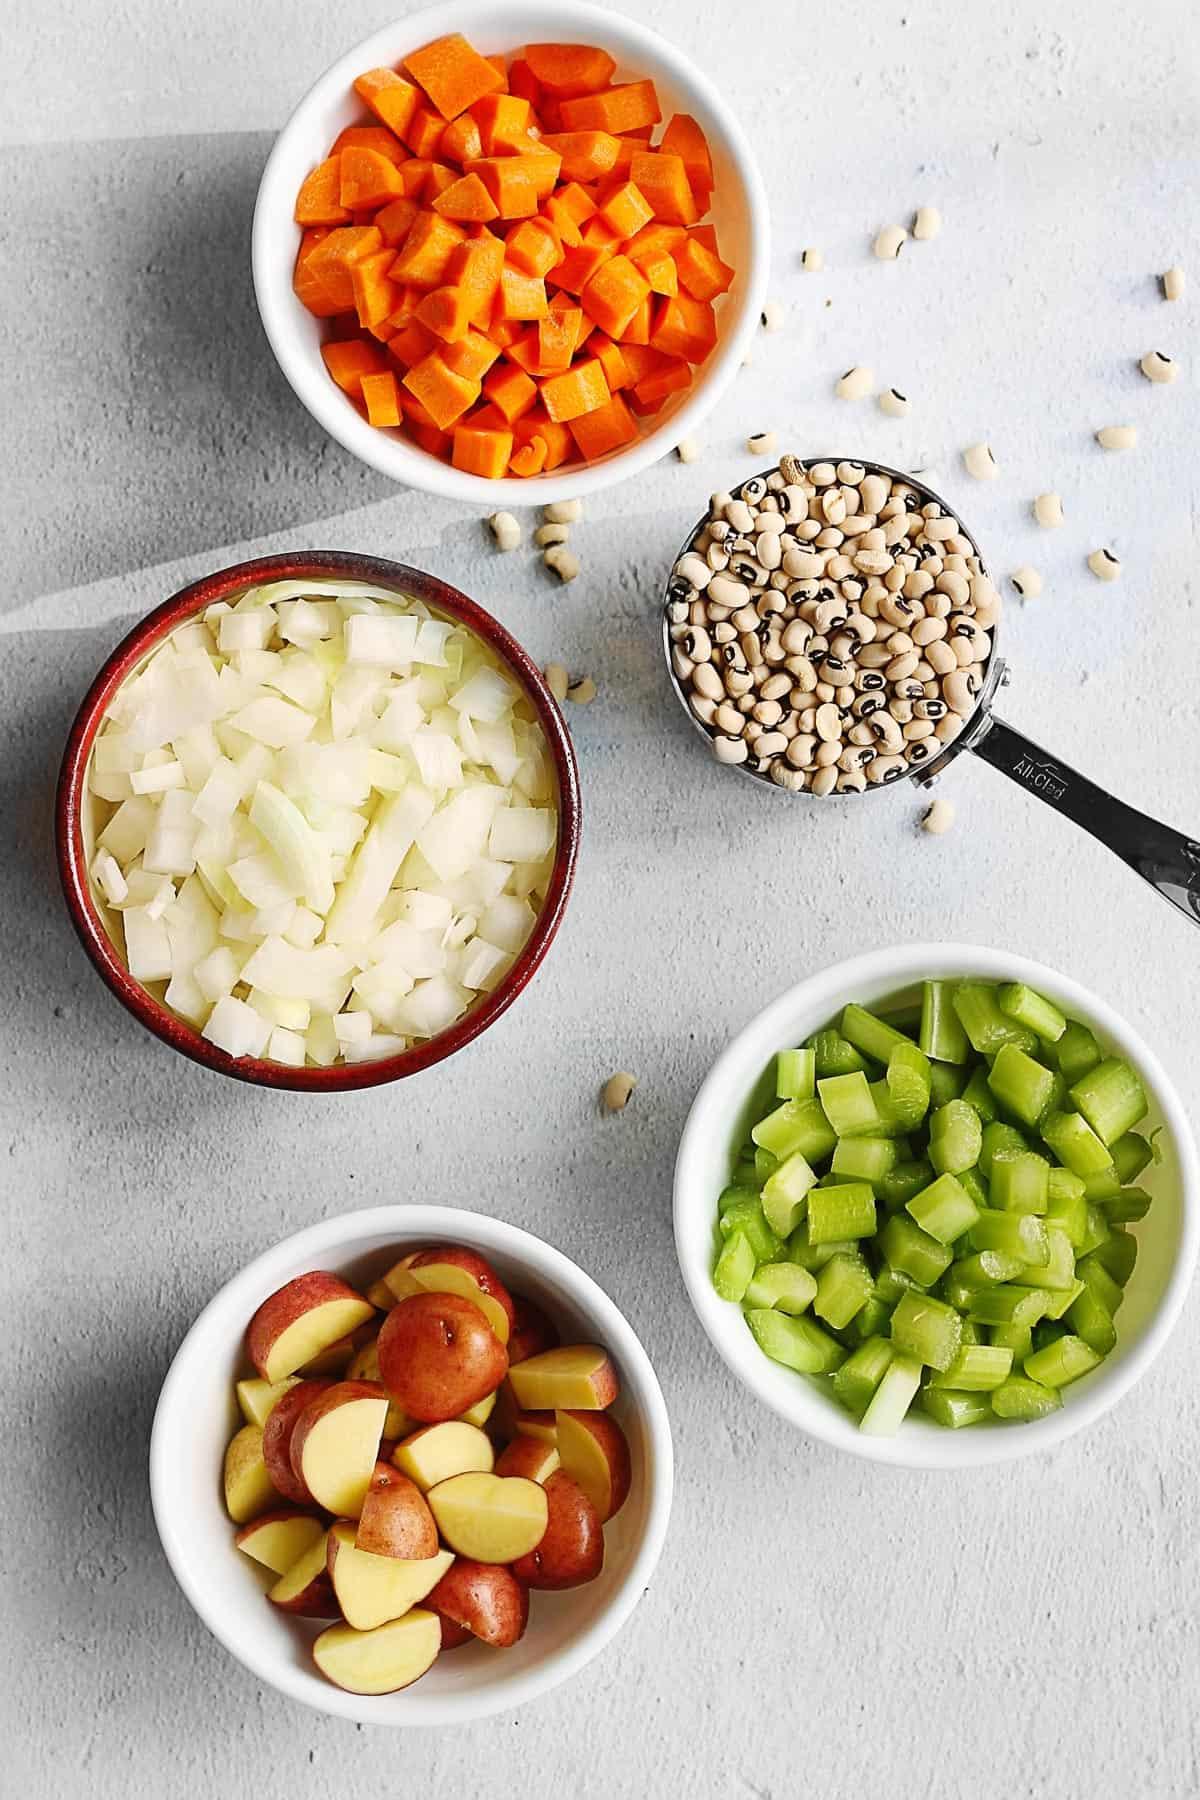 Black eyed pea soup recipe ingredients